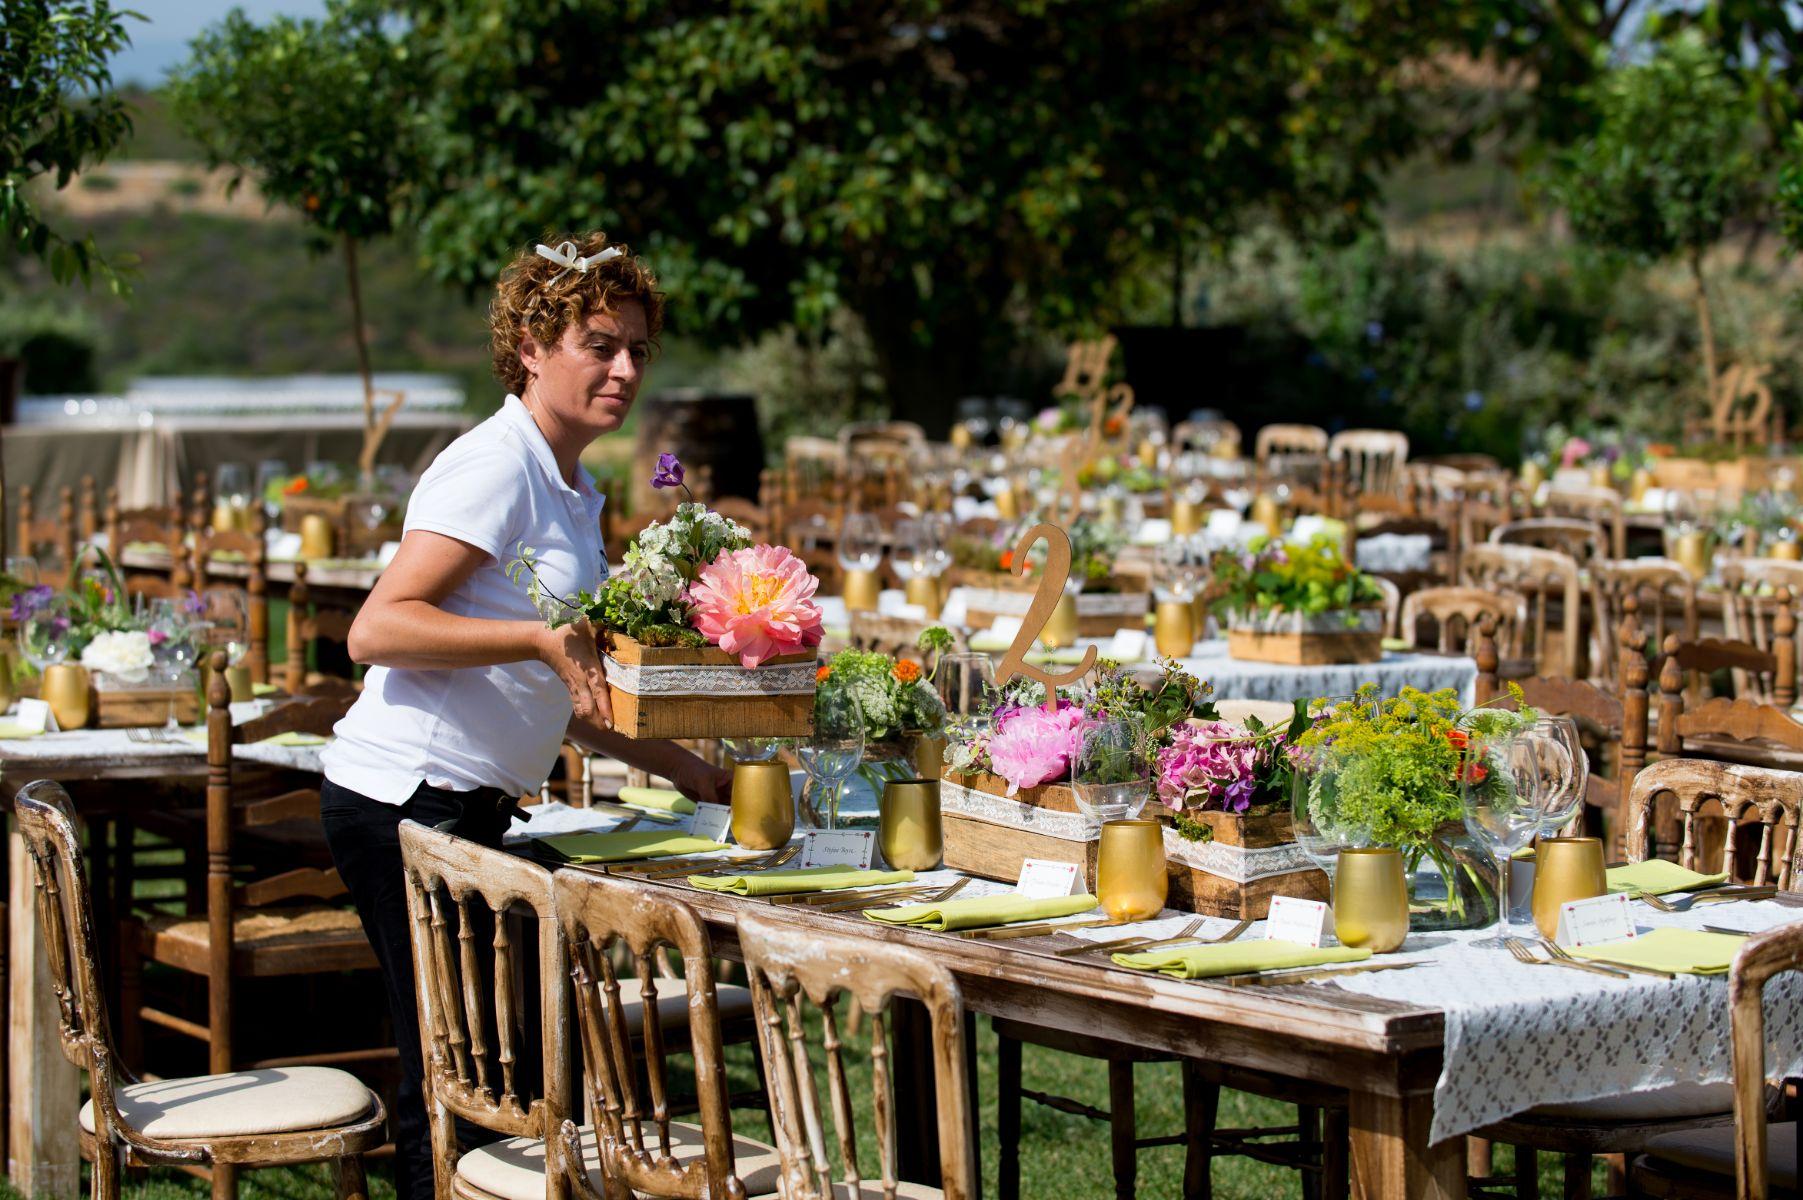 Helpers preparing the wedding reception.